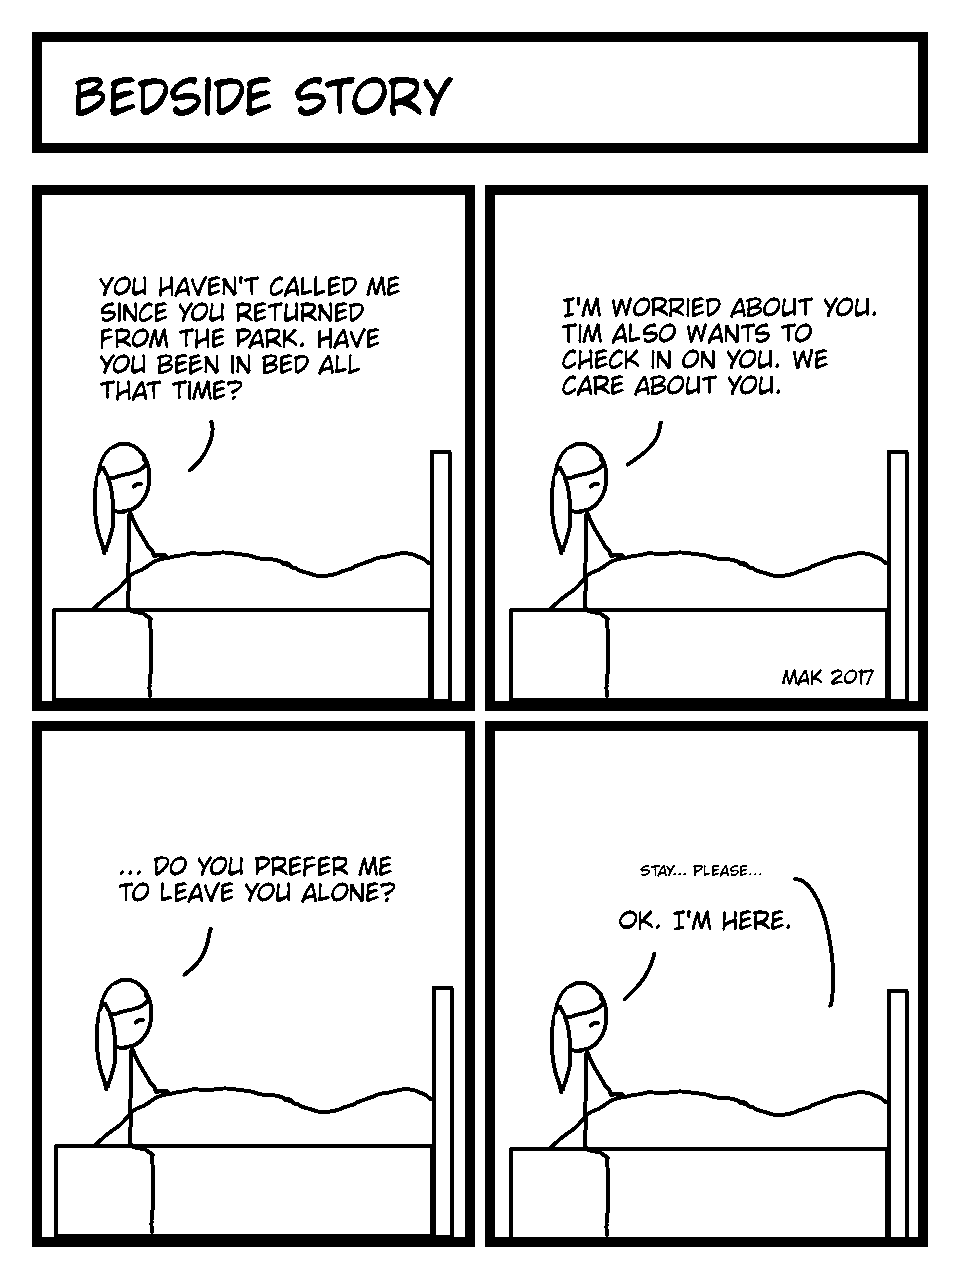 Bedside Story